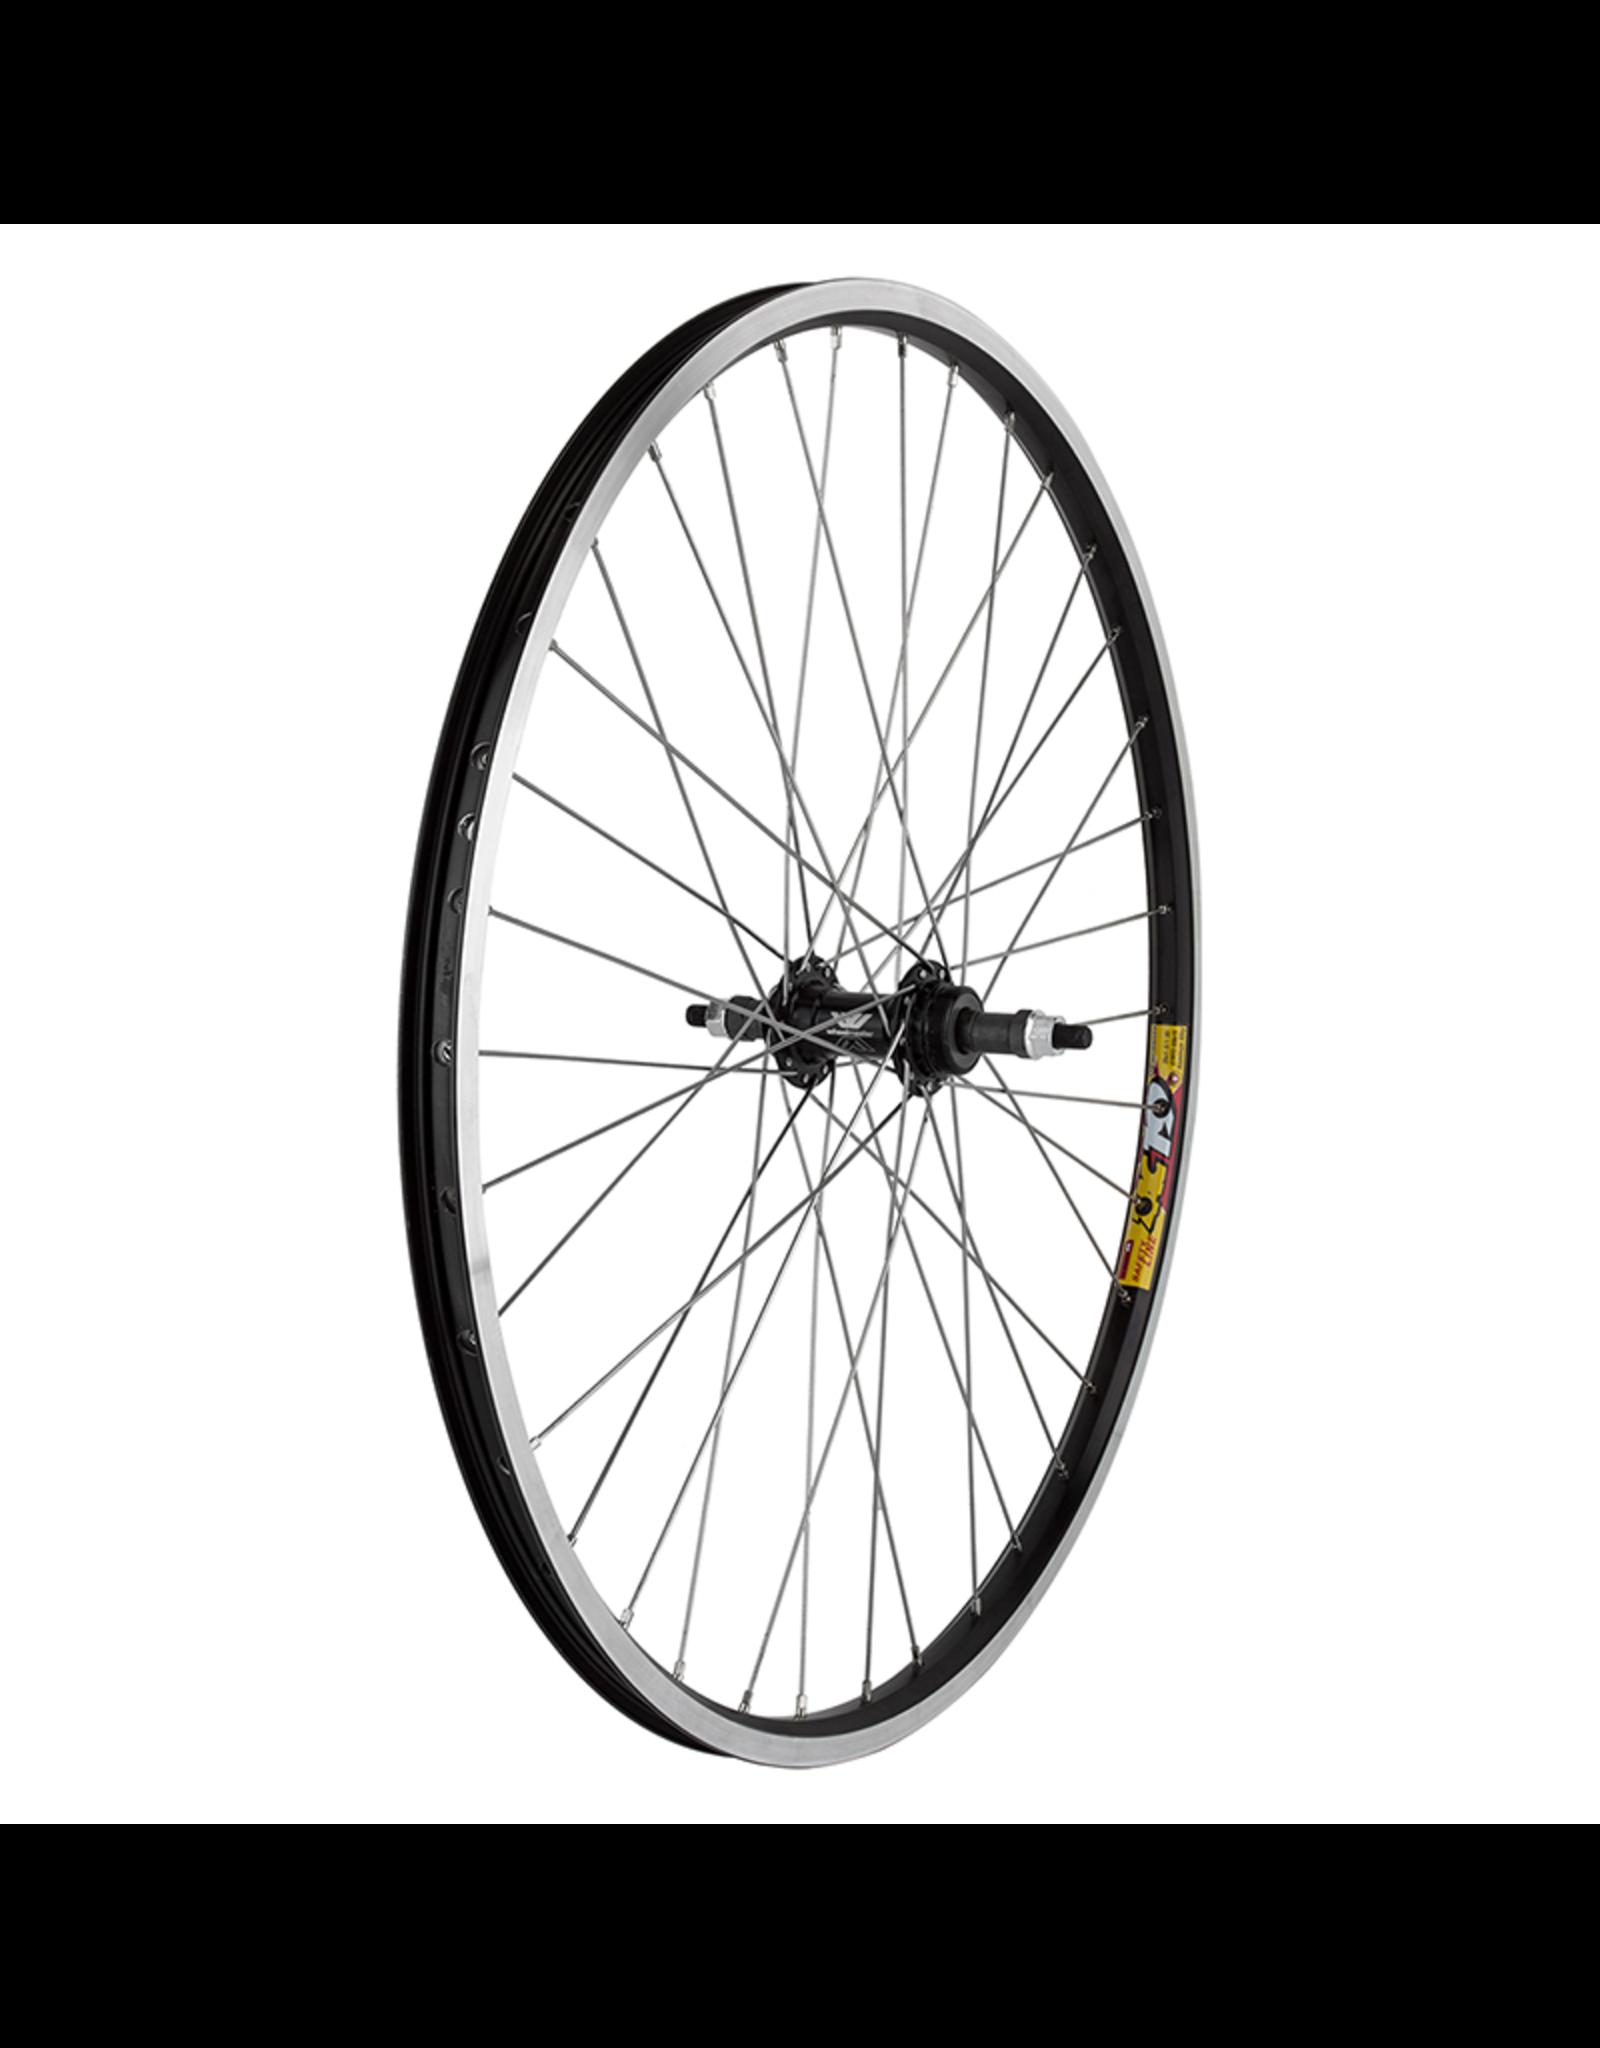 "Wheelmaster 26"" Alloy Mountain Double Wall Rear Wheel"